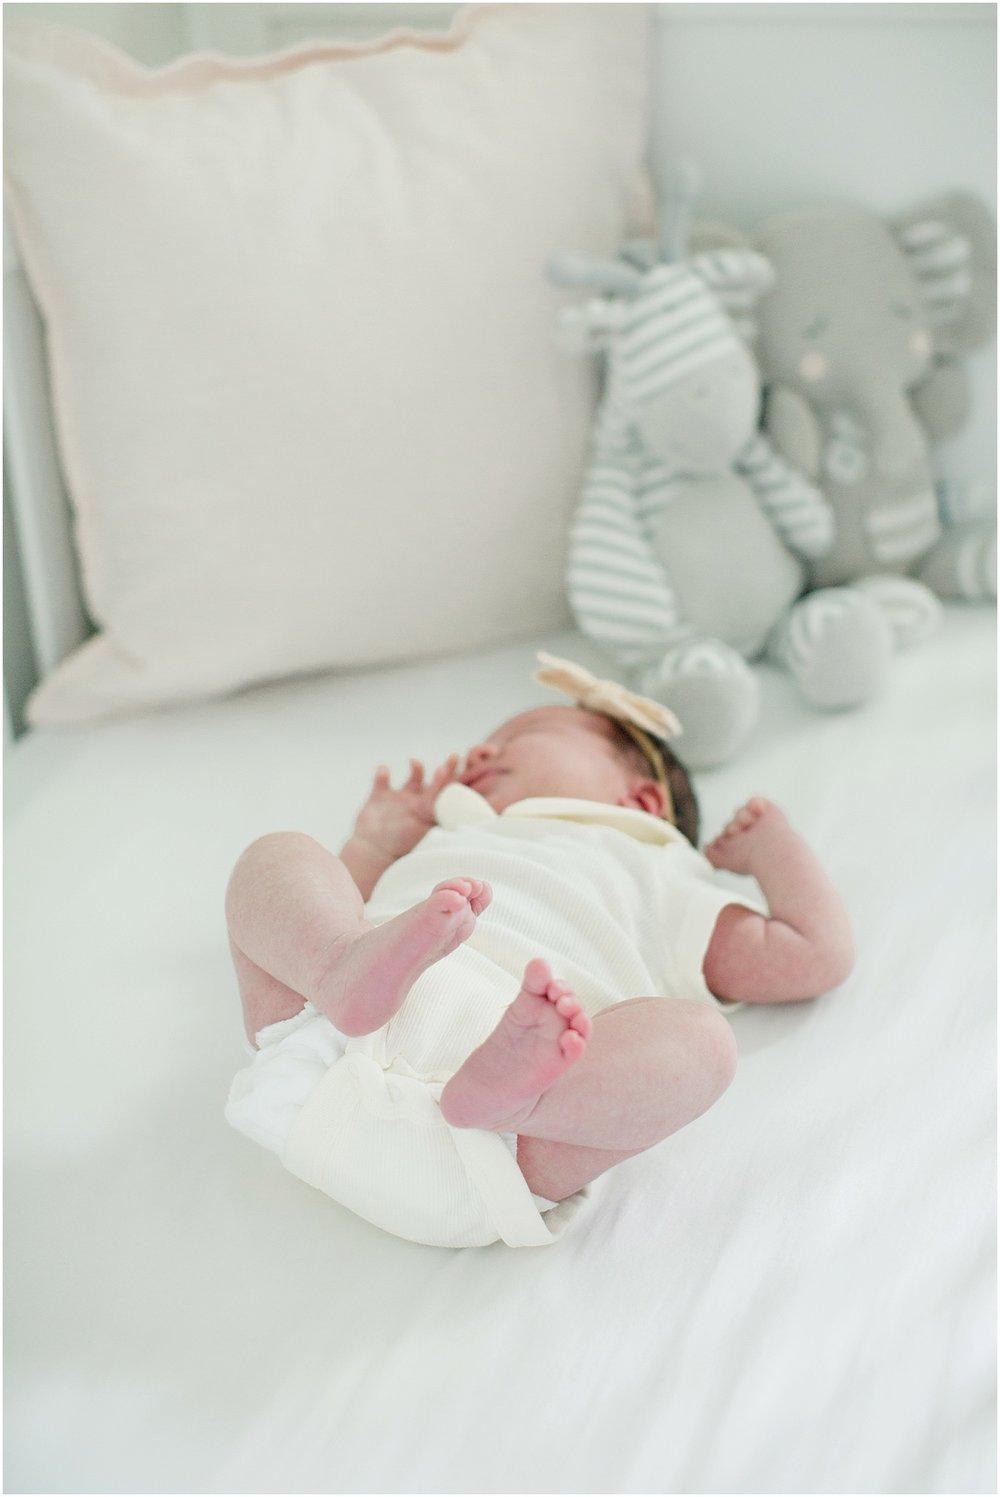 Ashley Powell Photography Quinn Newborn Blog Images_0080.jpg